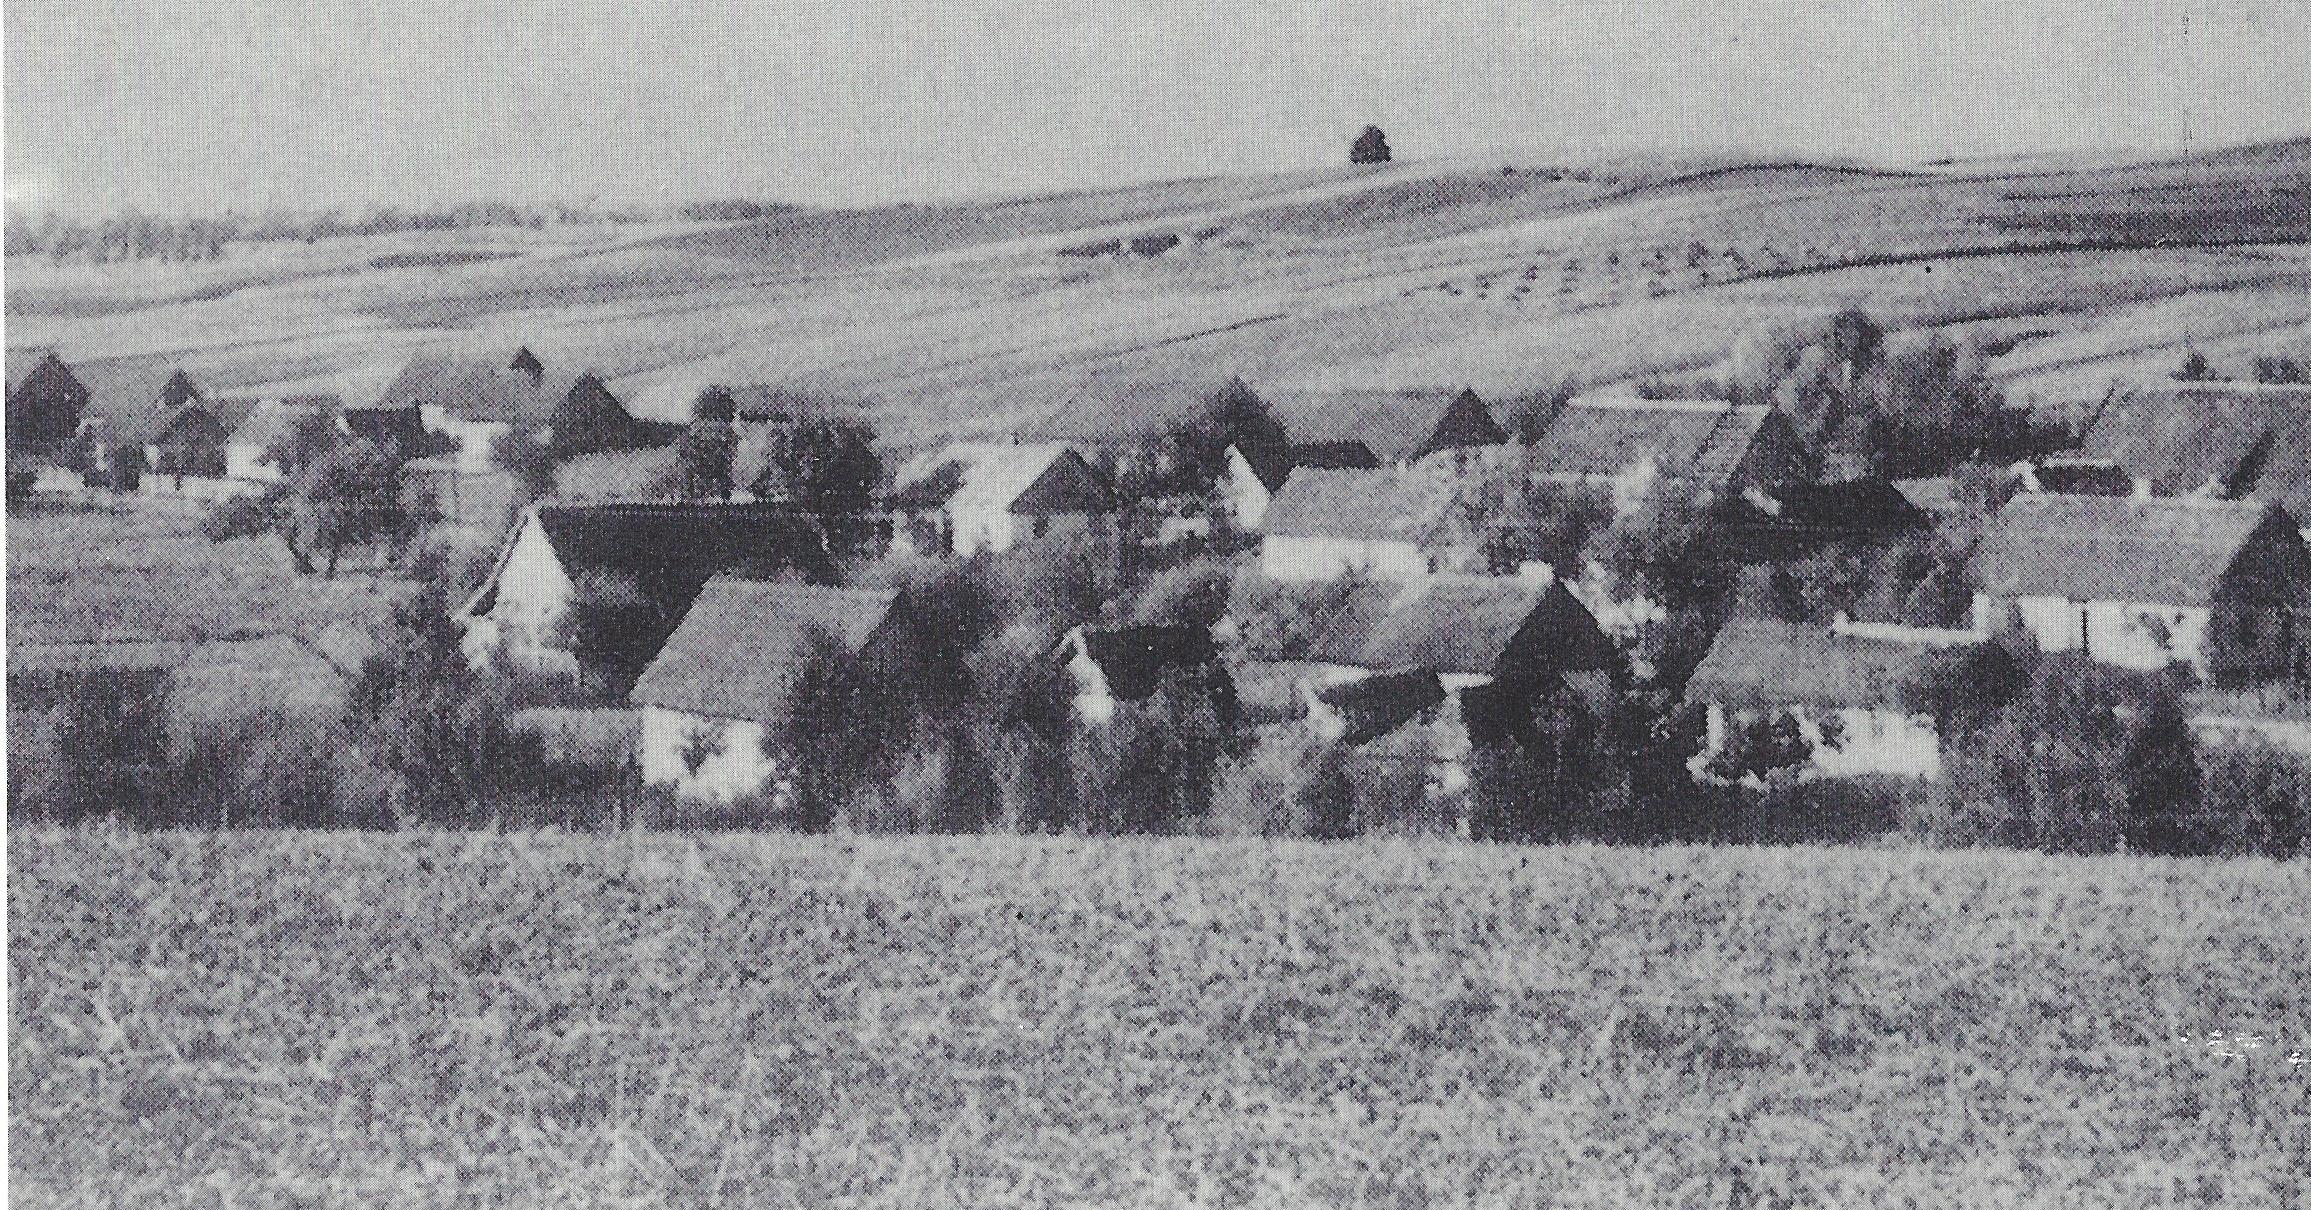 Wolynien